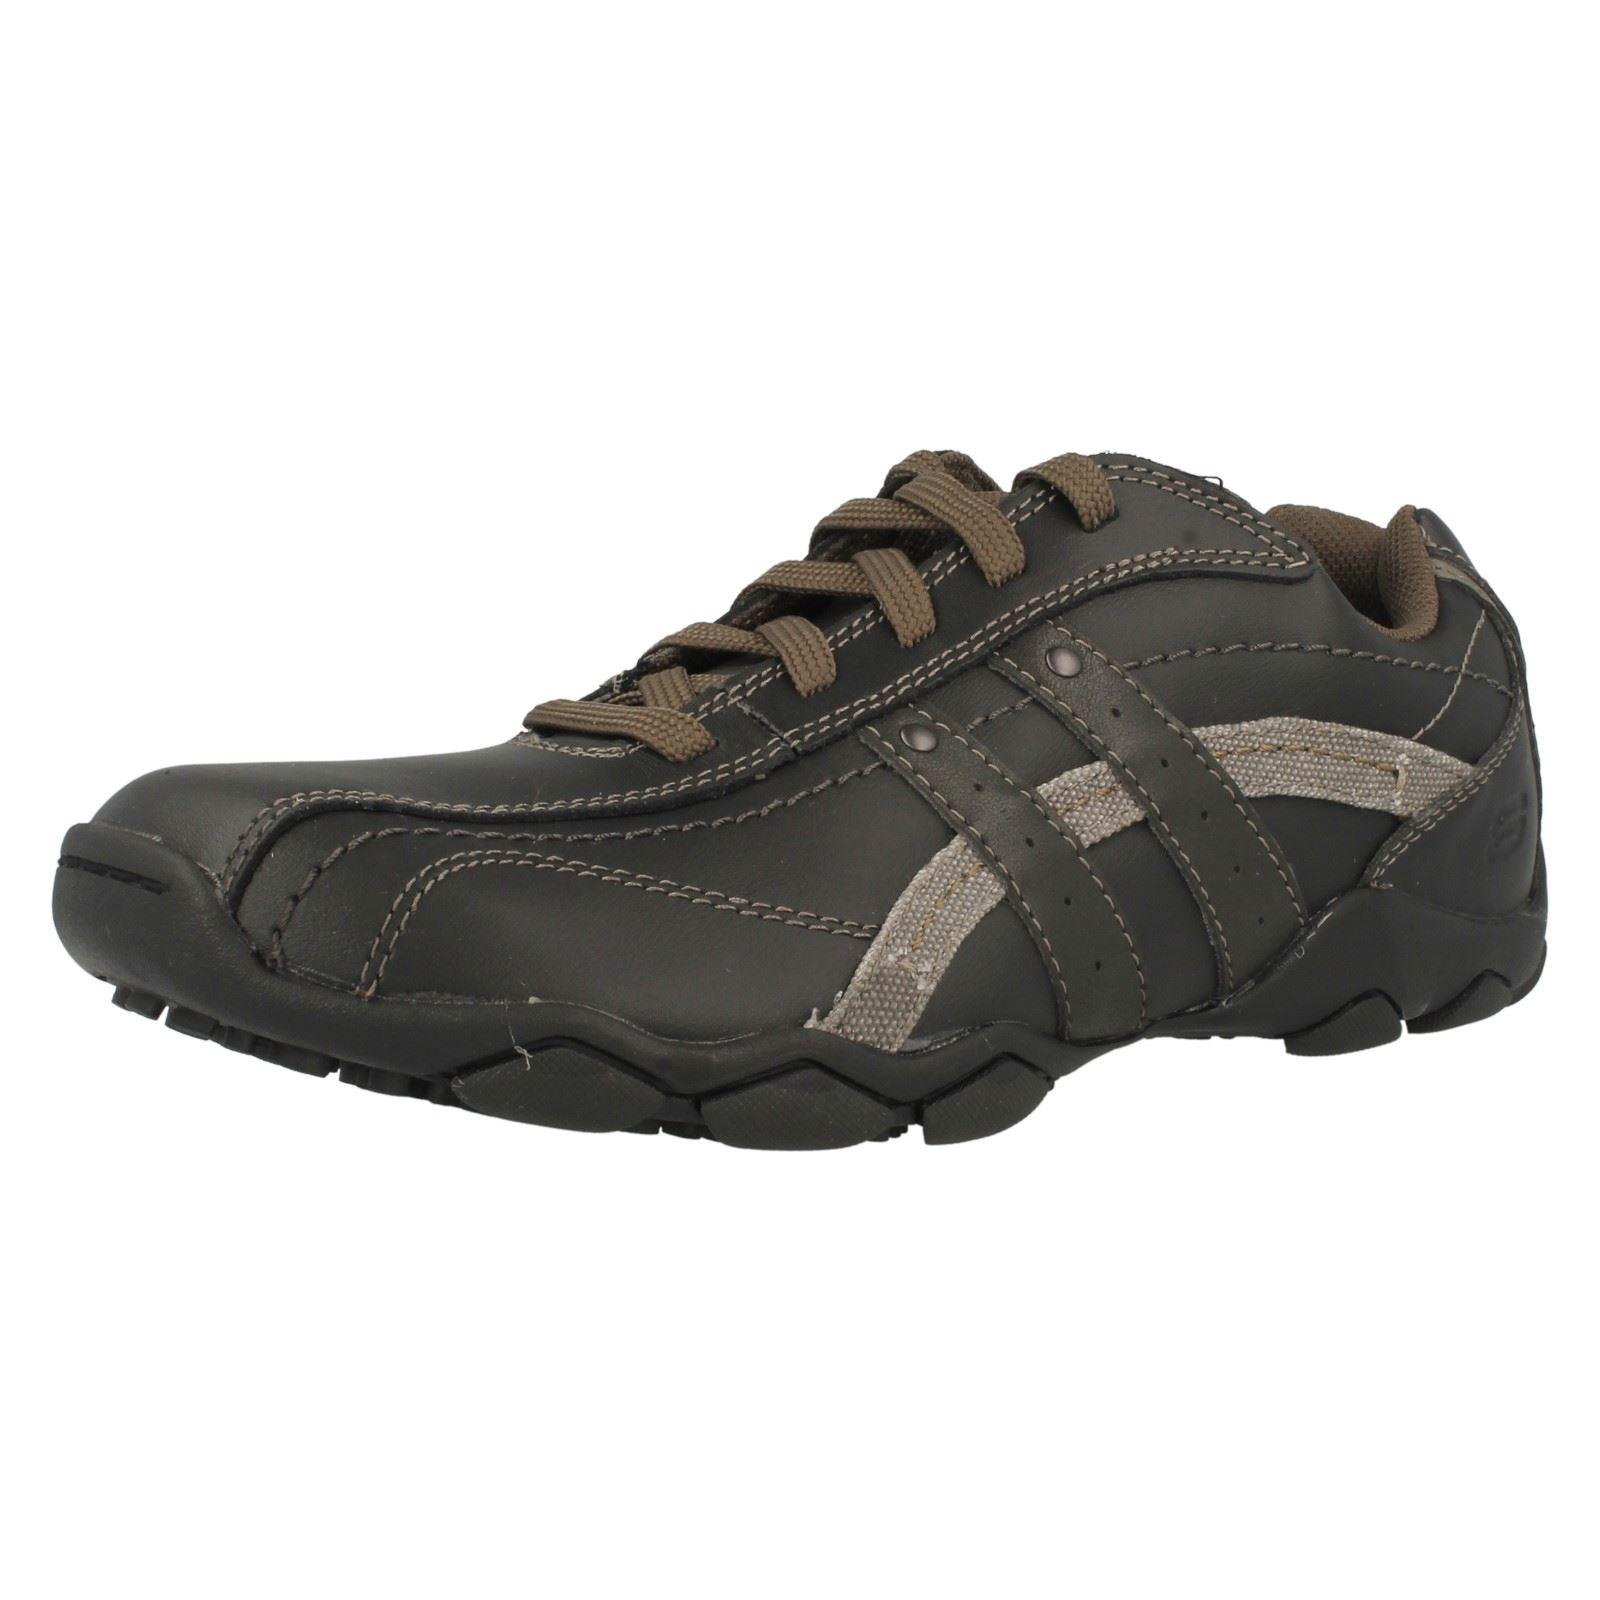 Uomo Skechers Blake Casual Casual Blake Schuhe d922c0